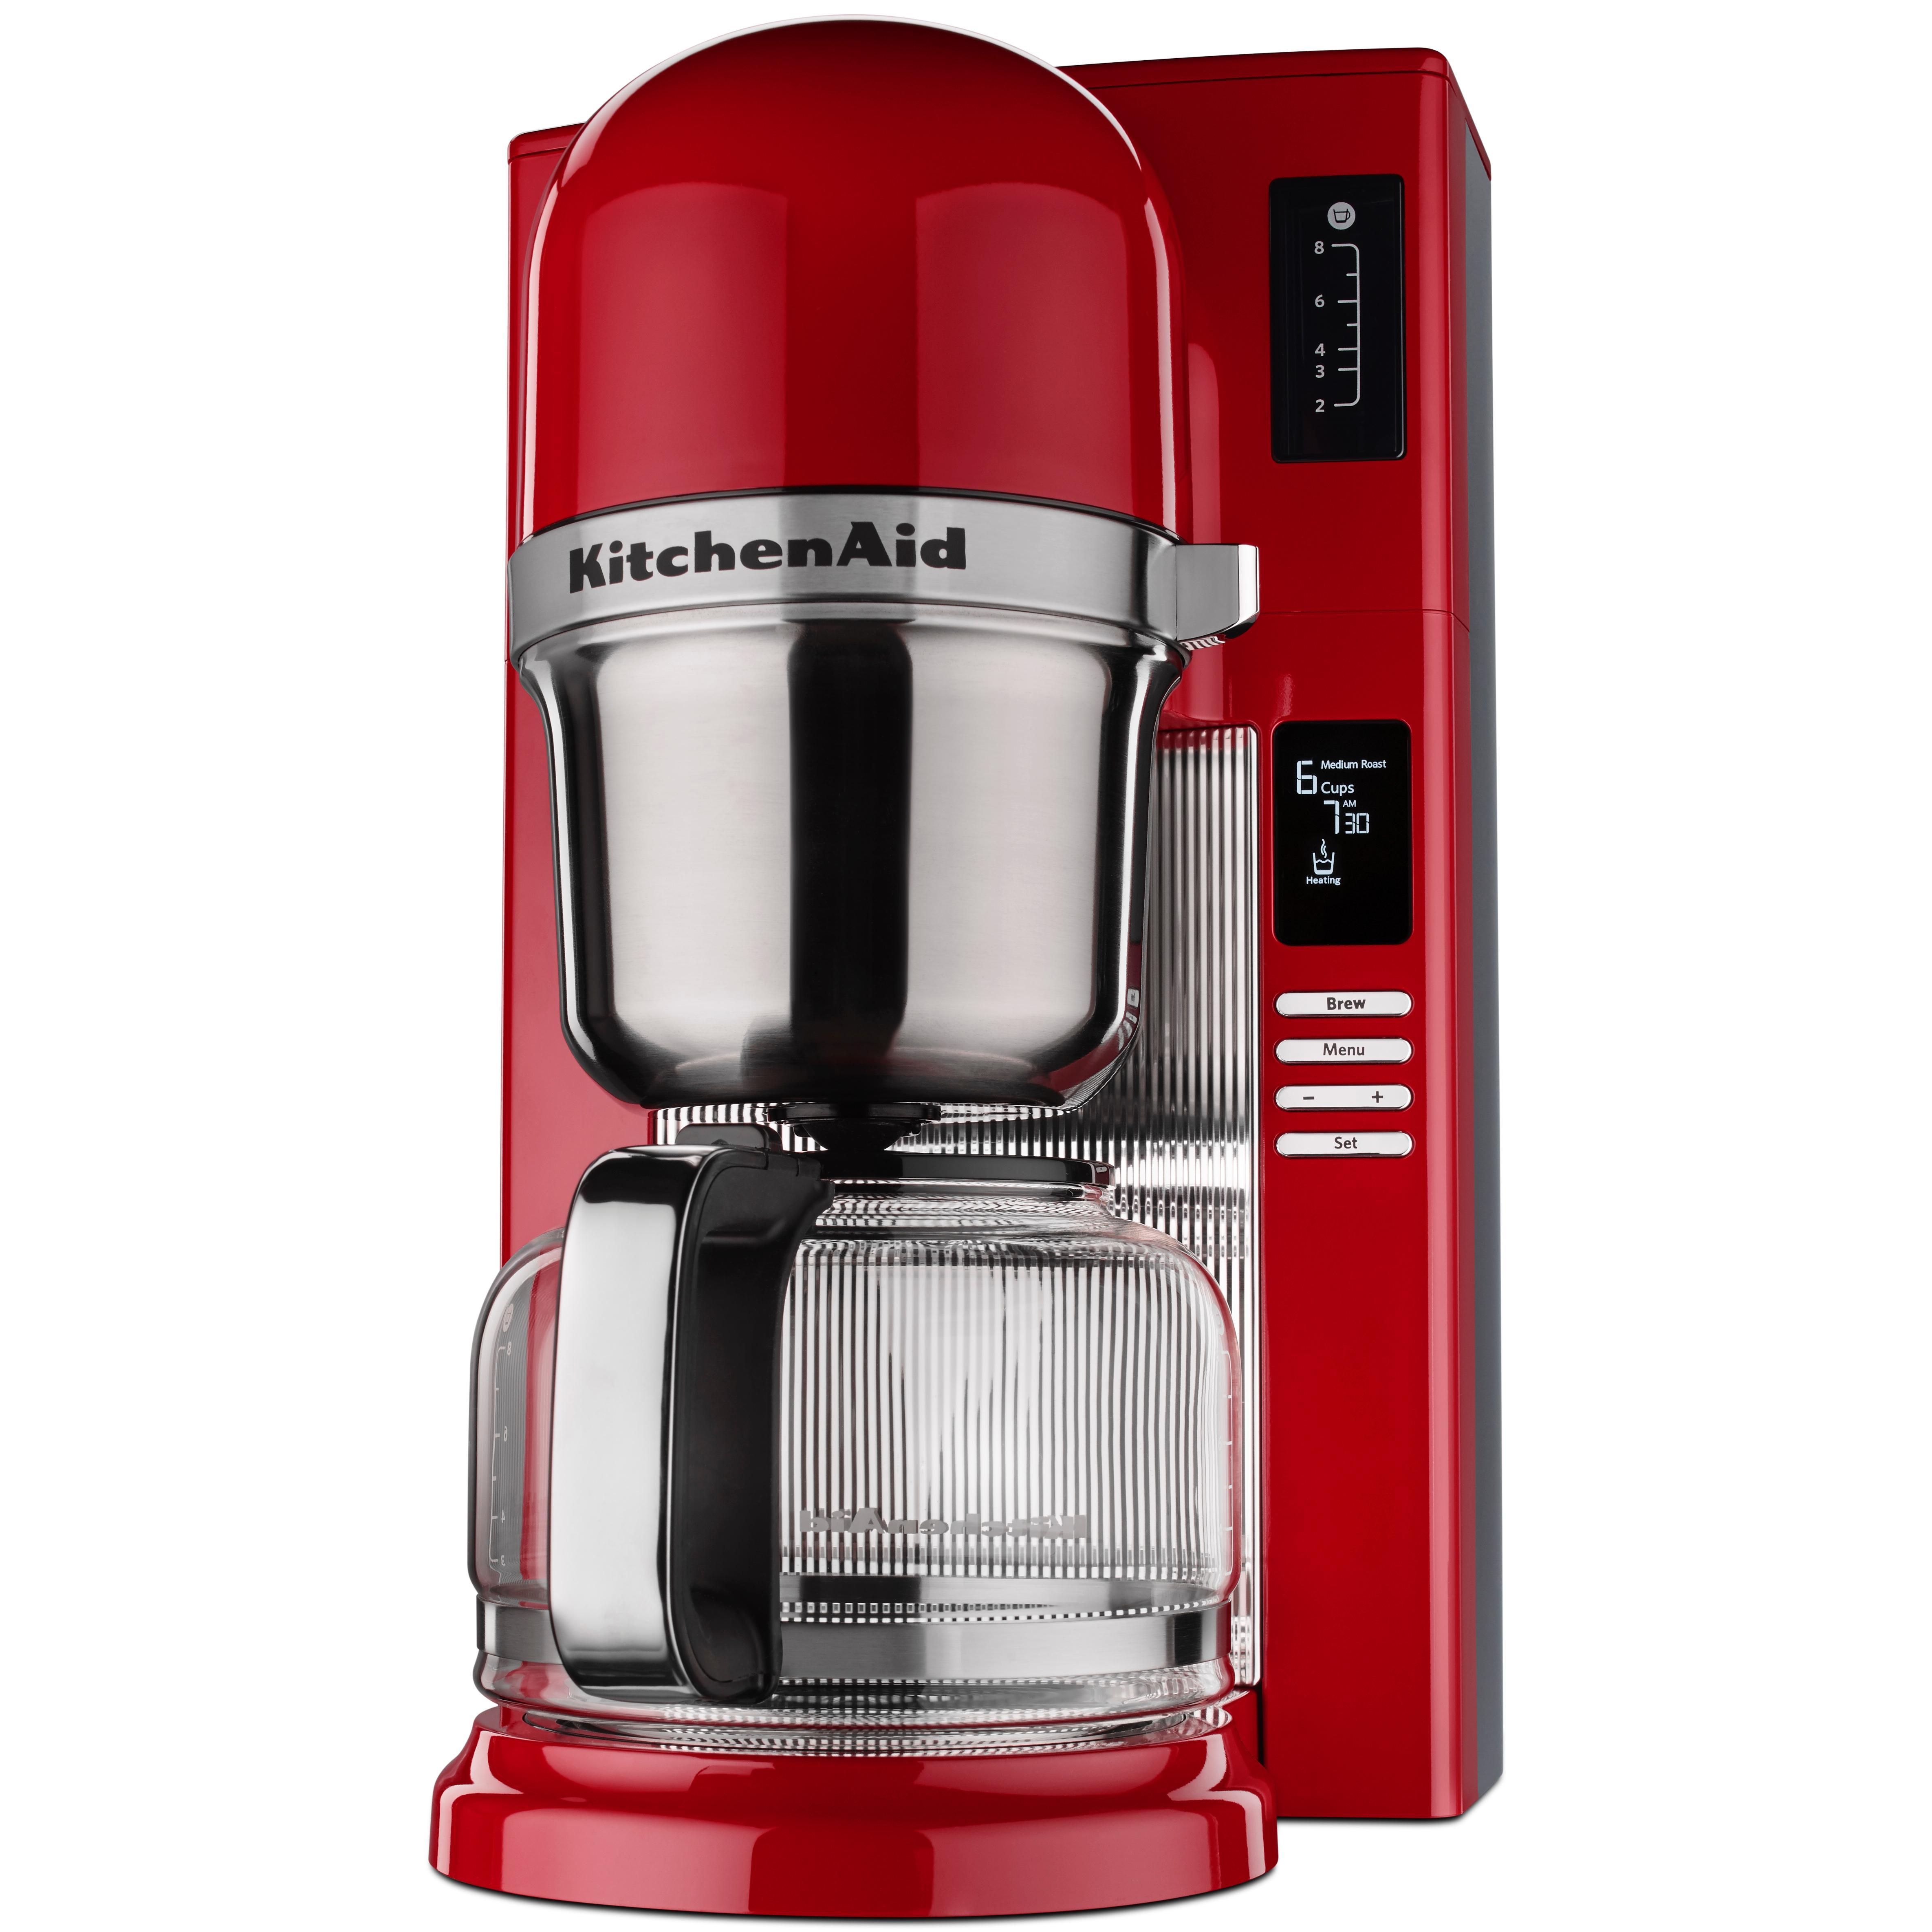 Pour Over Coffee Maker Handmade : KitchenAid KCM0802OB Pour Over Coffee Brewer, Onyx Black 725407150607 eBay